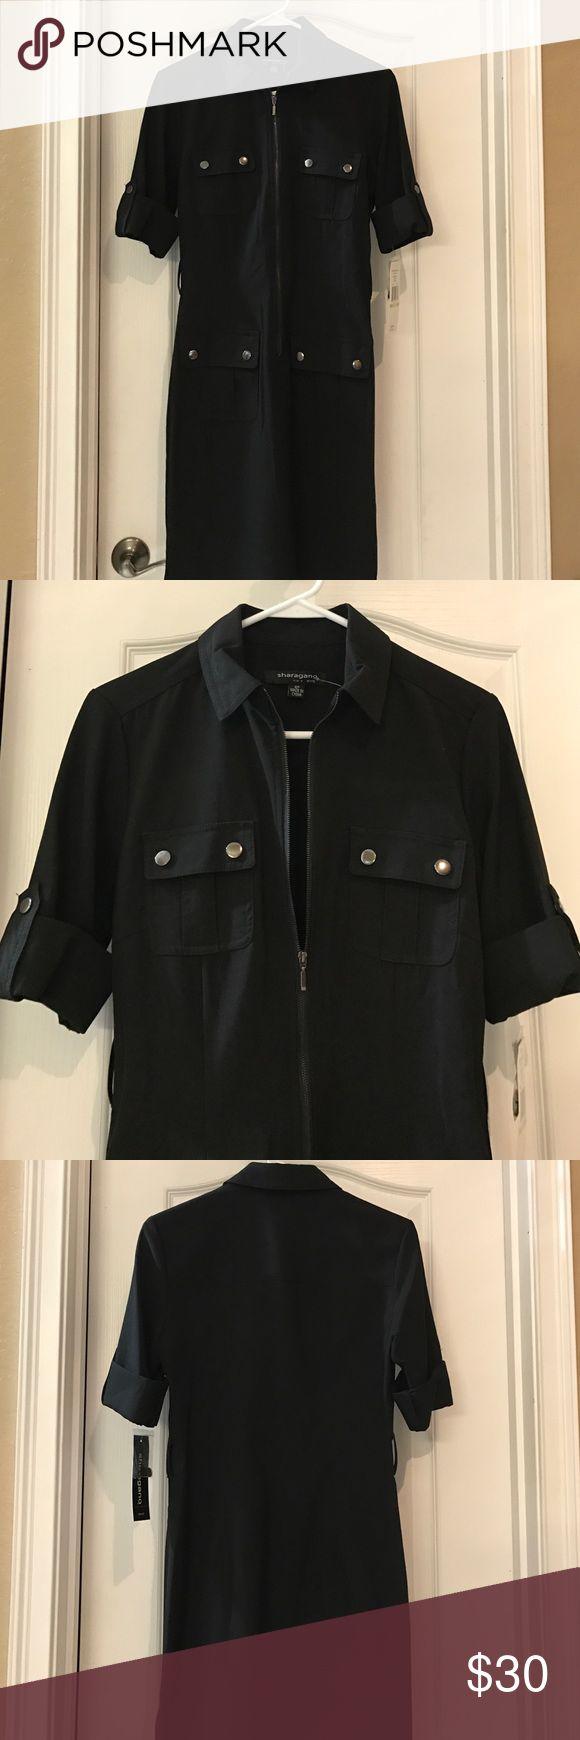 New black zip up dress 👗 w/ 4 functional pockets. New Black zip up dress 👗 with four functional pockets. Stretch sharagano Dresses Midi